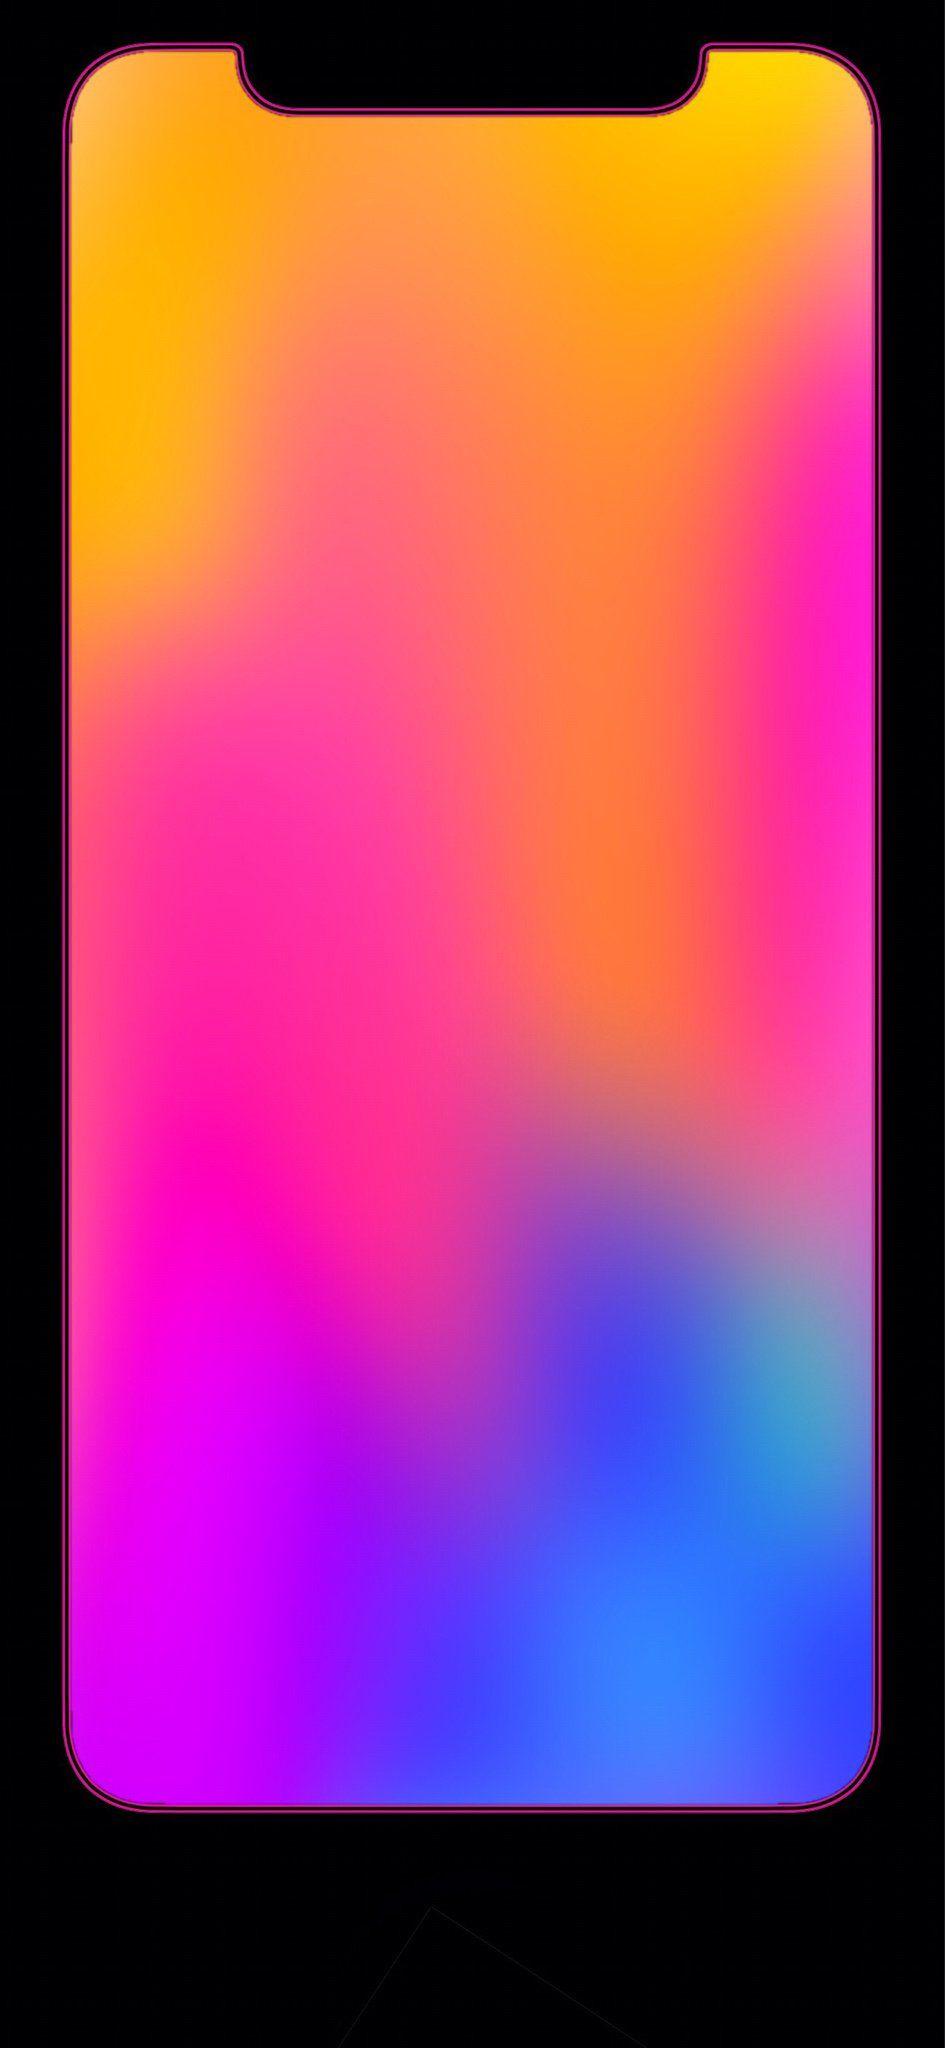 Iphone X Border Wallpaper Blue